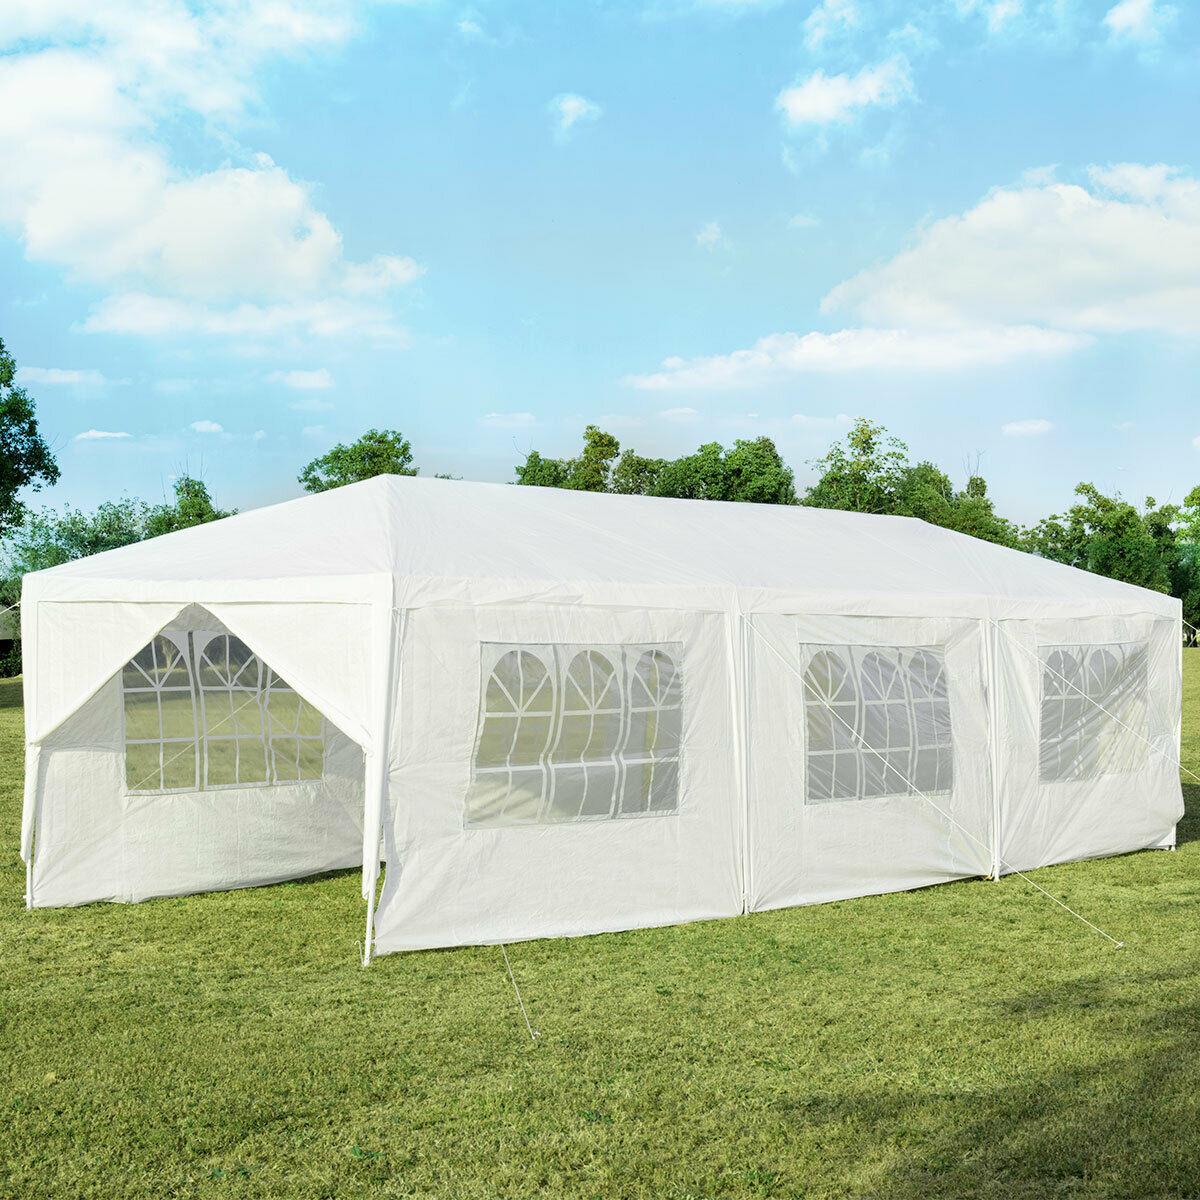 10'x30' Outdoor Party Wedding Tent Canopy Heavy duty Gazebo Pavilion 8 Sidewall  OP3936WH